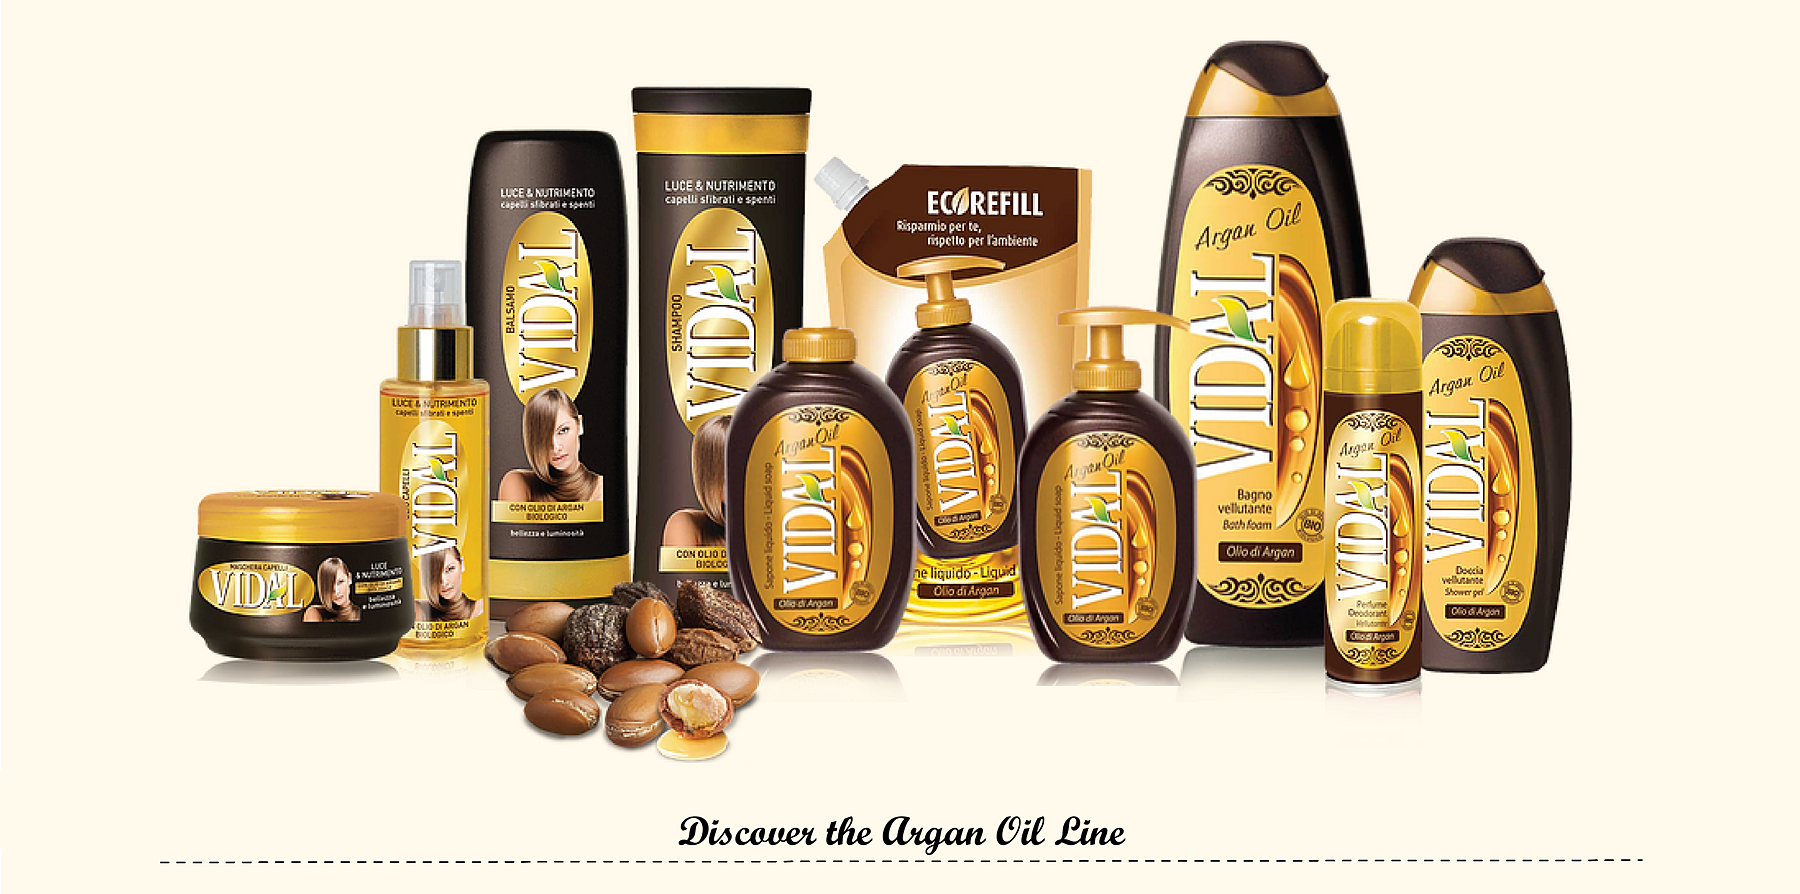 intimate hygiene line argan oil line